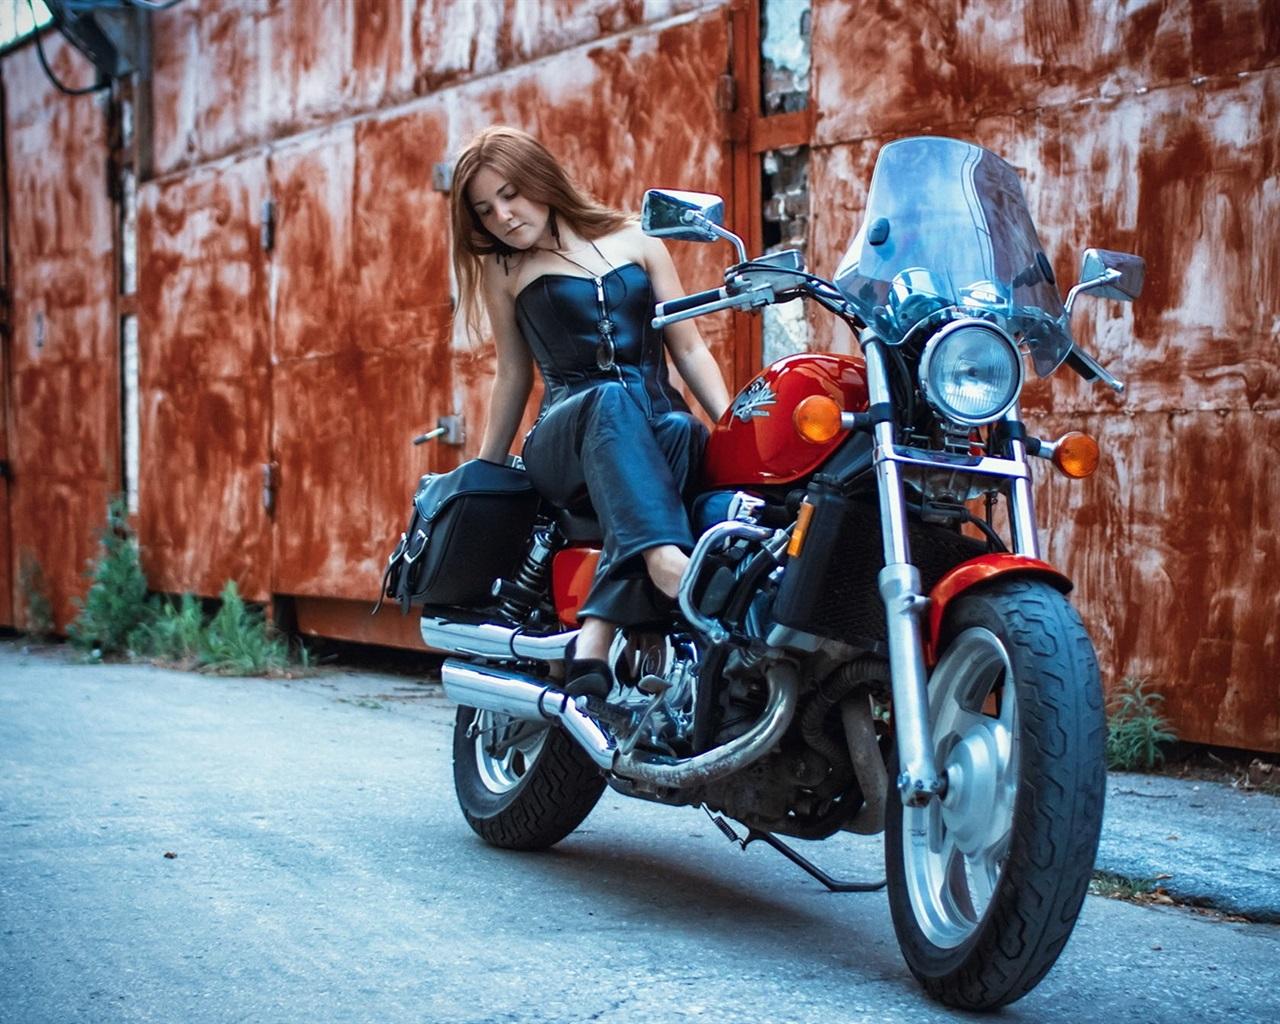 Wallpaper Motorcycle Street Girl 1920x1080 Full Hd 2k